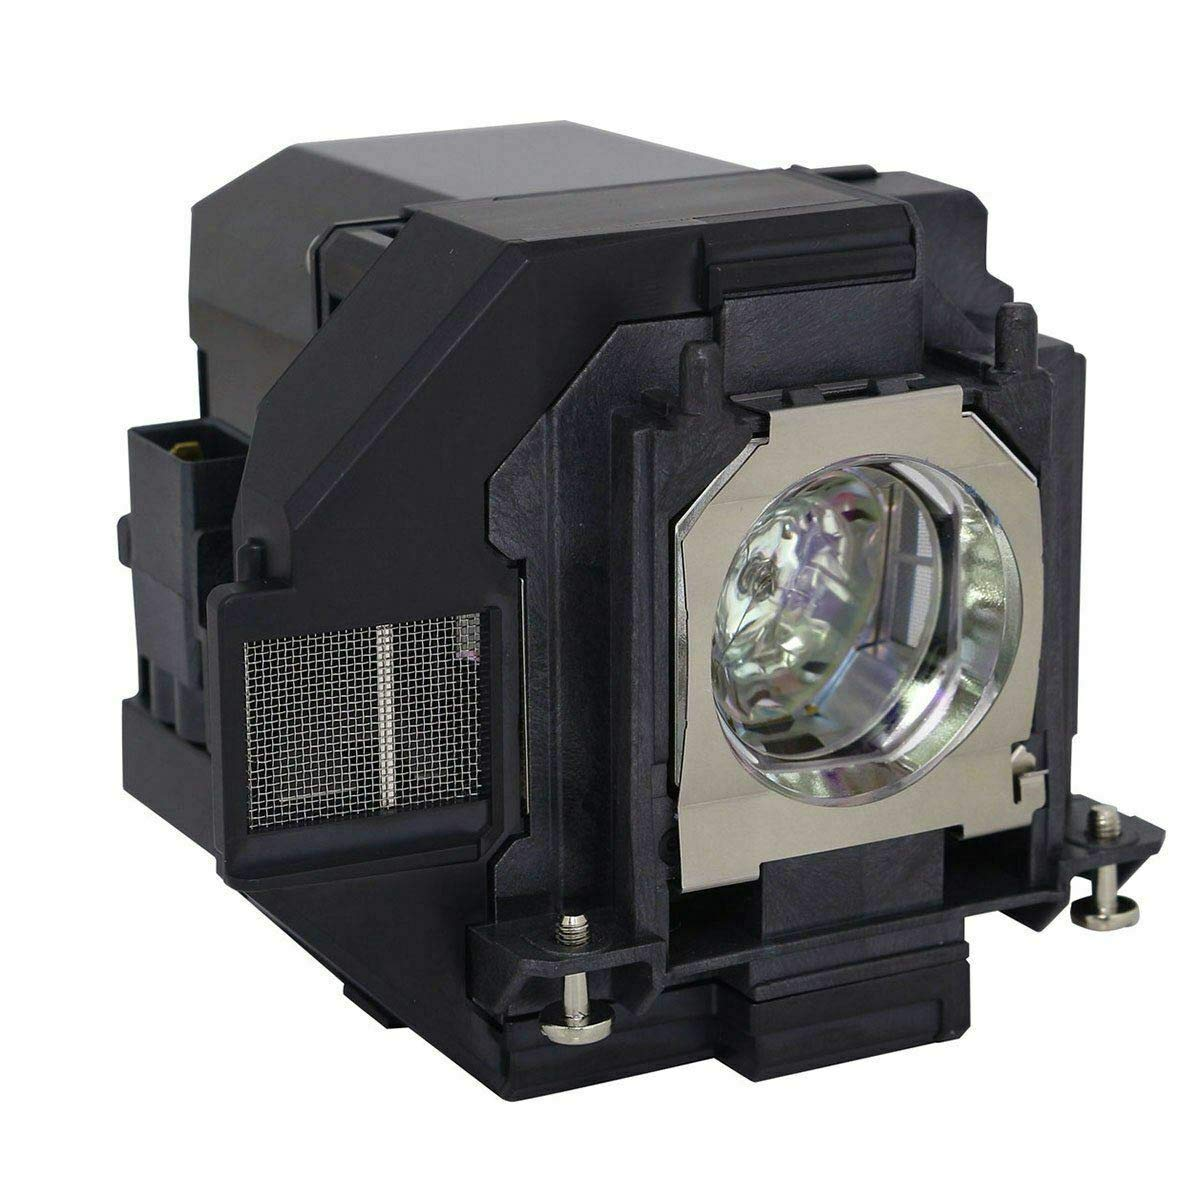 CTLAMP A+ 高品質交換用プロジェクターランプ ハウジング付き EB-108 EB-2042 EB-960W EB-970 EB-980Wに対応 B07RL5NT1H